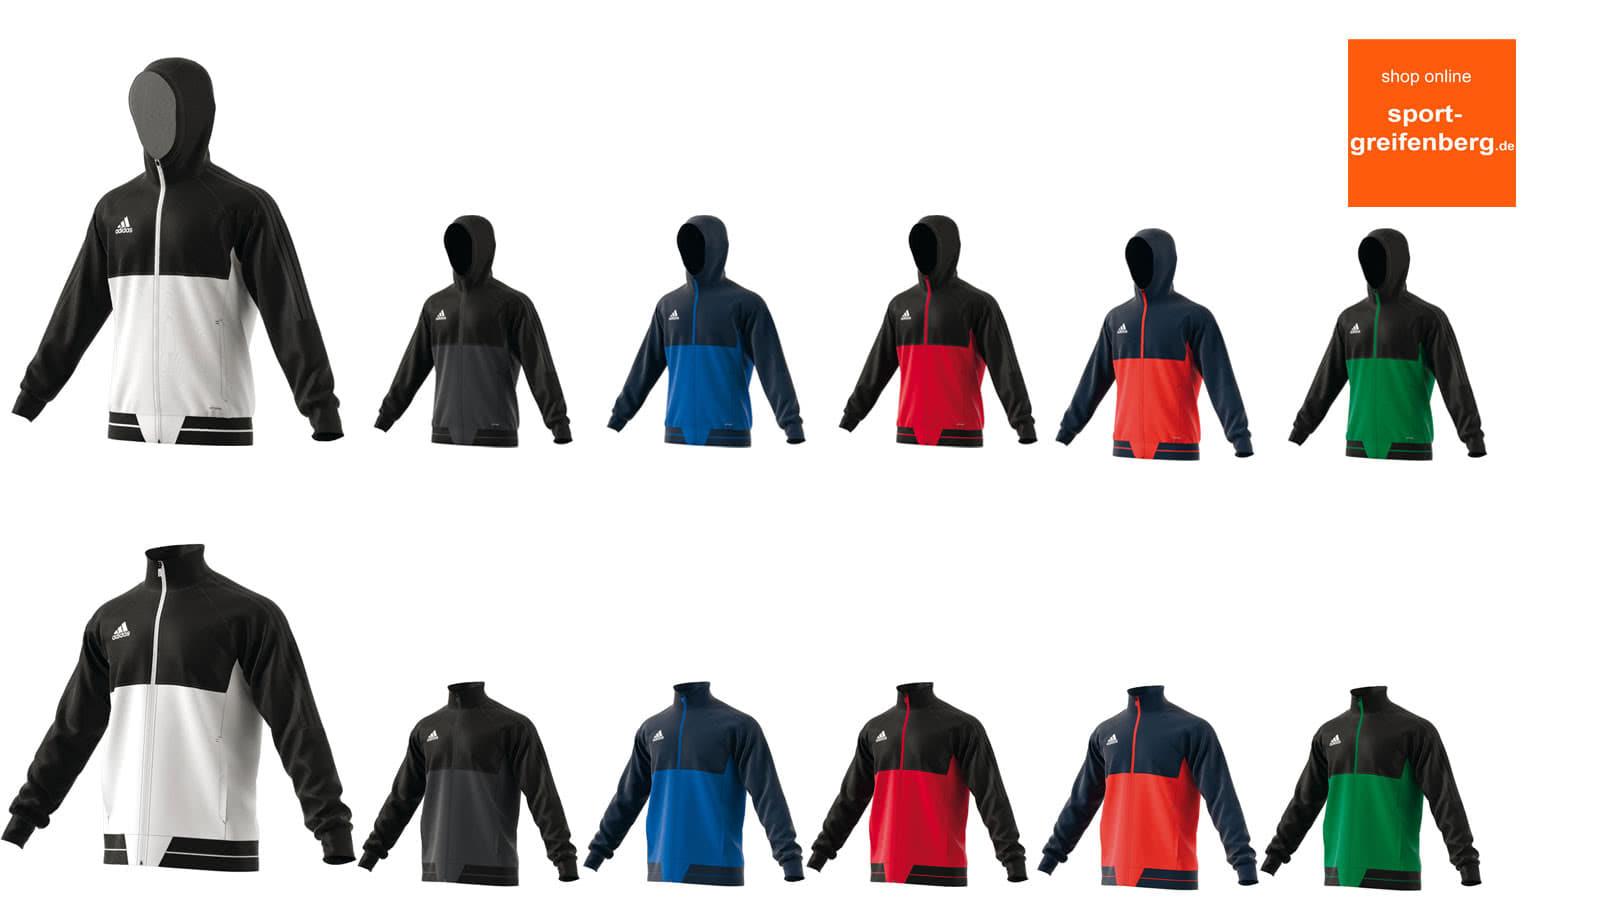 Adidas Tiro 17 Präsentationsanzug bestellen (Jacke + Hose)